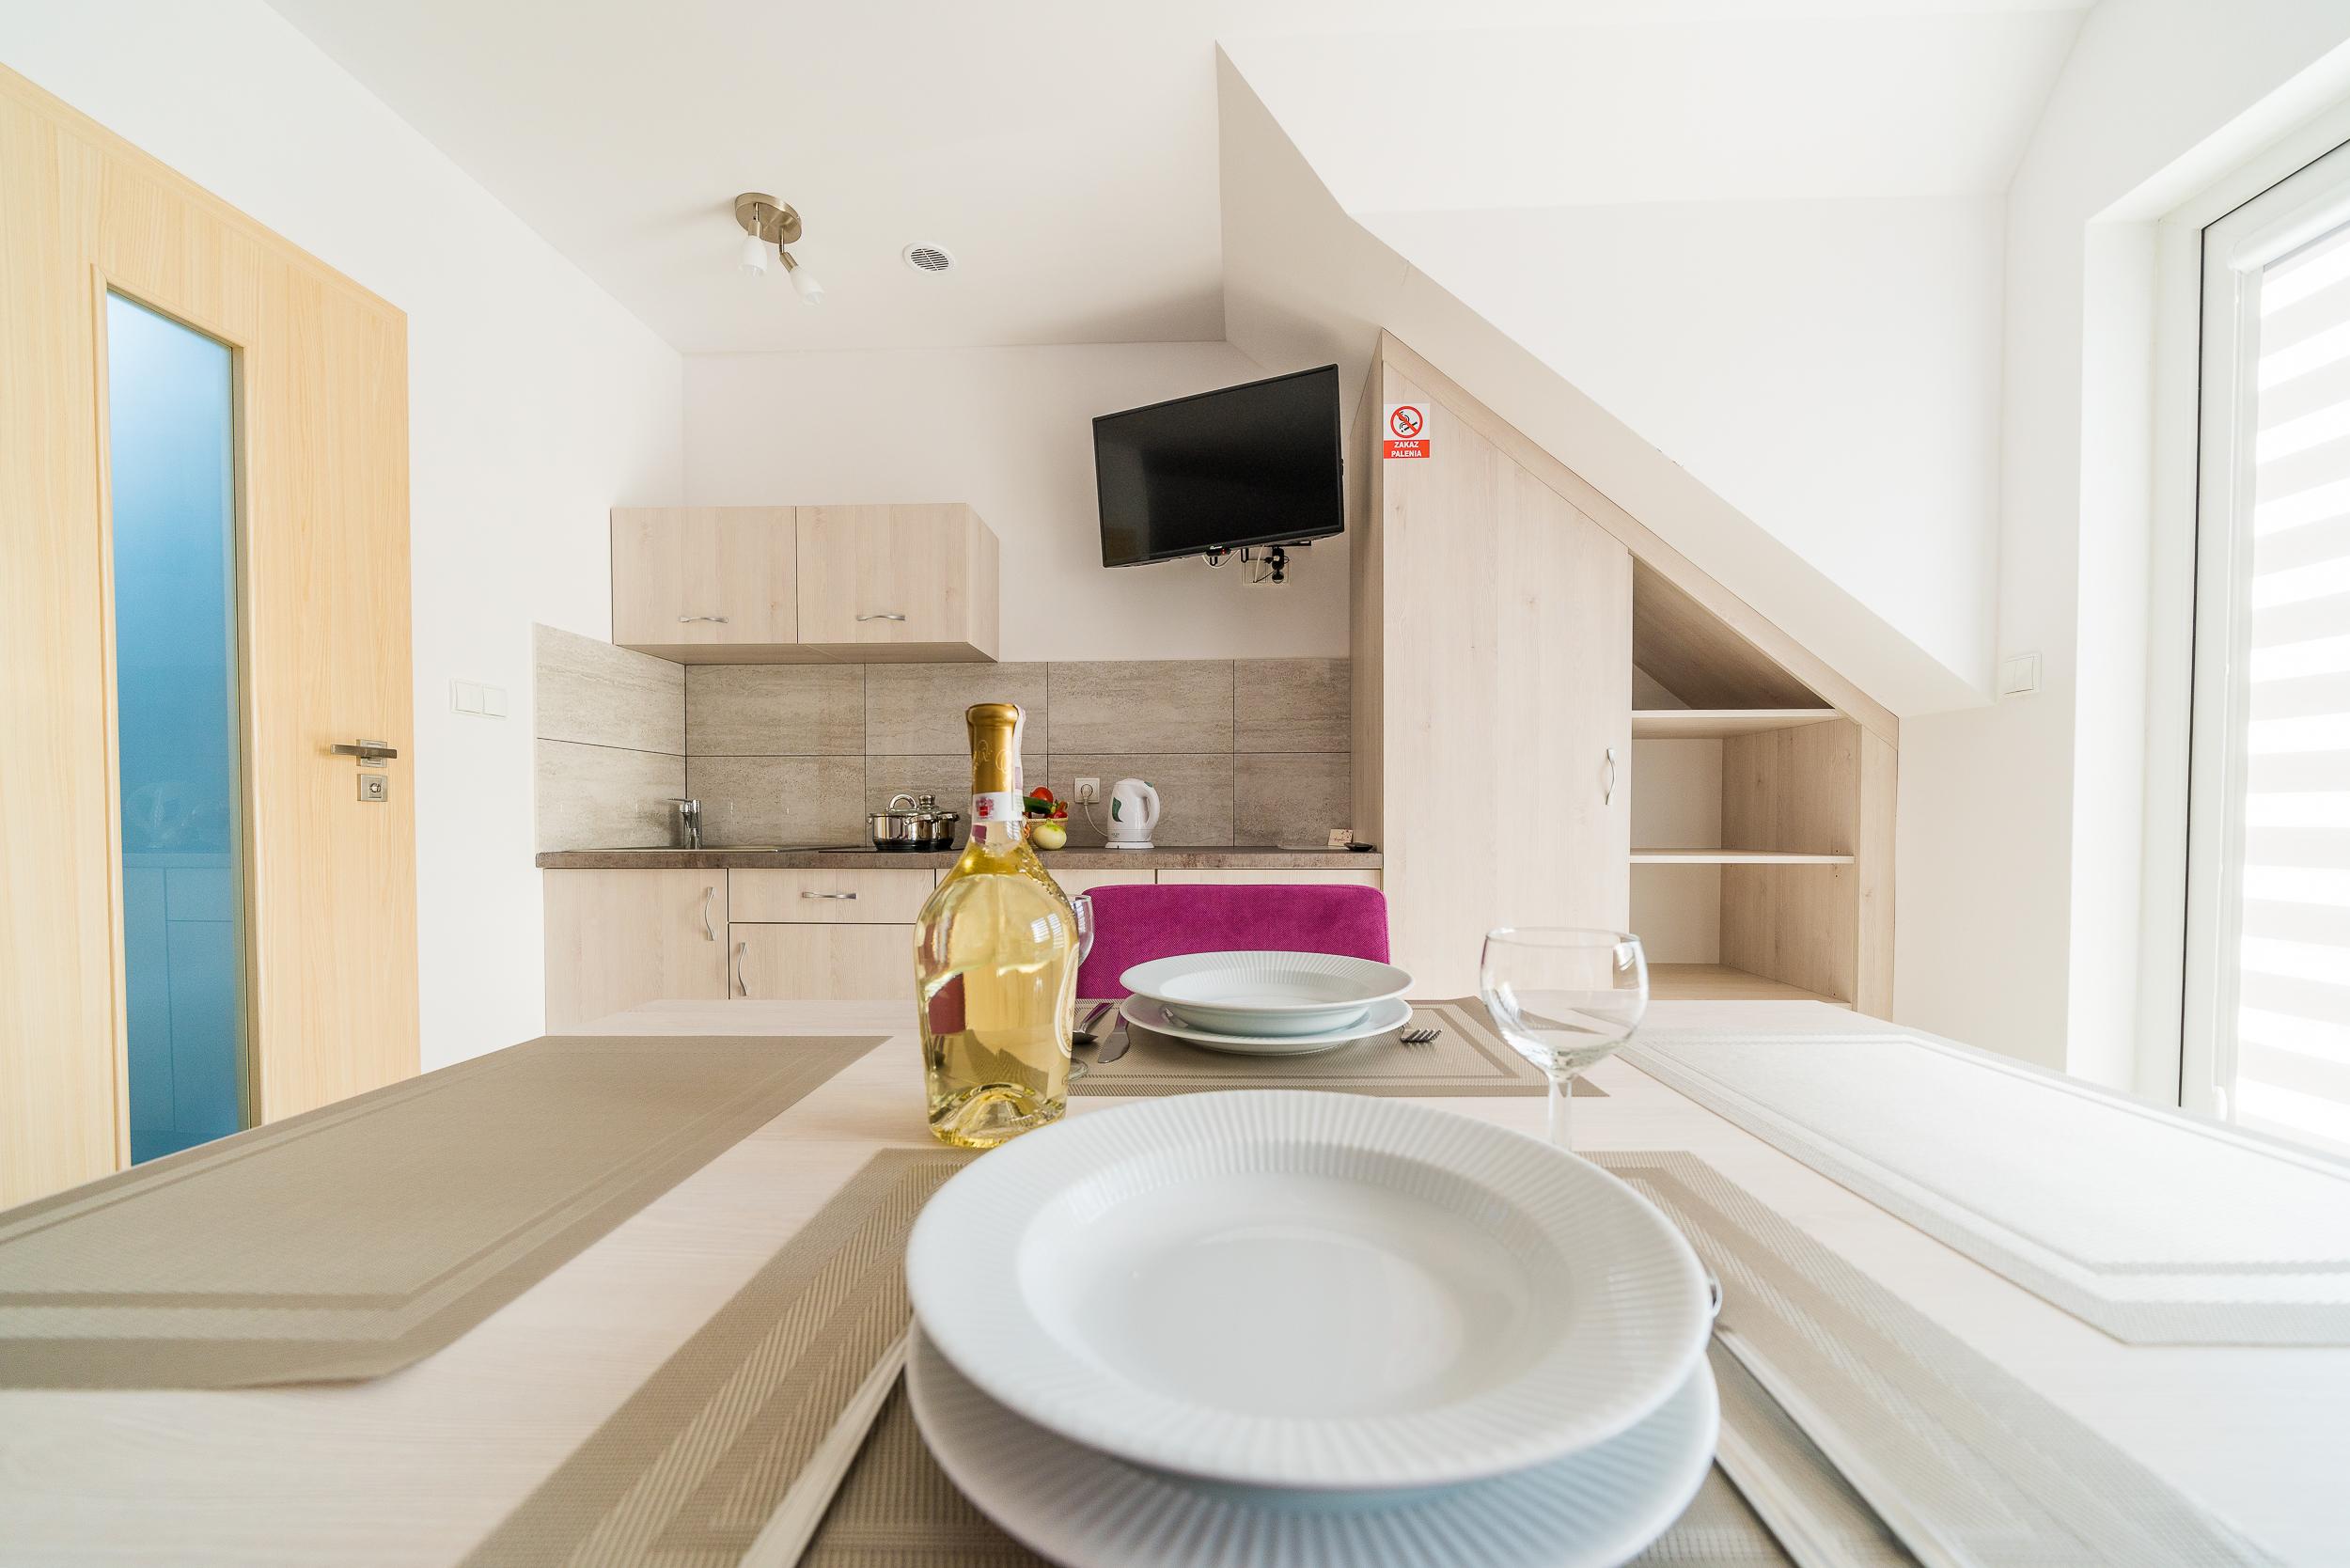 przestronny pokoj z aneksem kuchennym